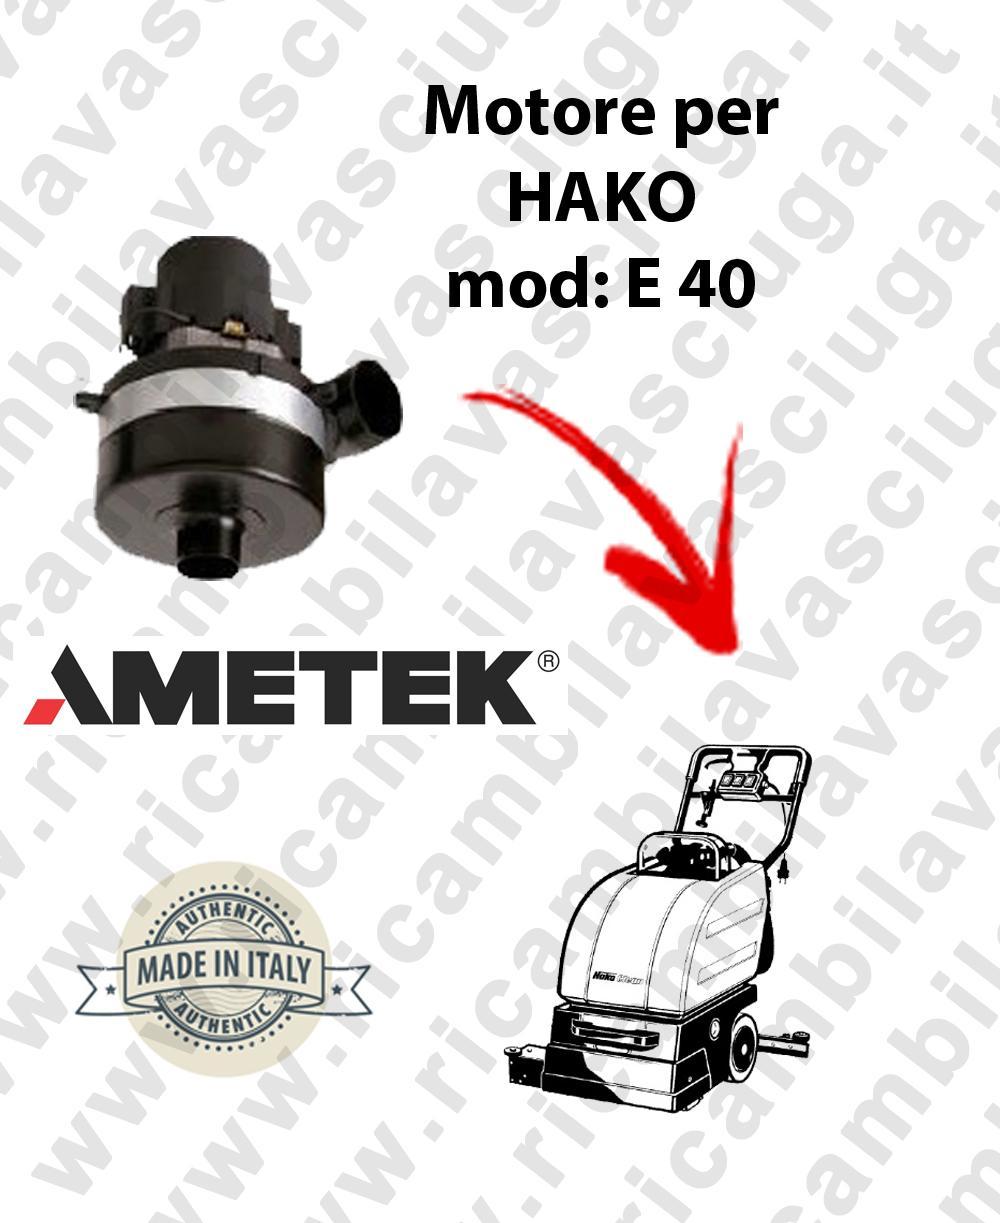 E 40 Saugmotor AMETEK für Scheuersaugmaschinen HAKO